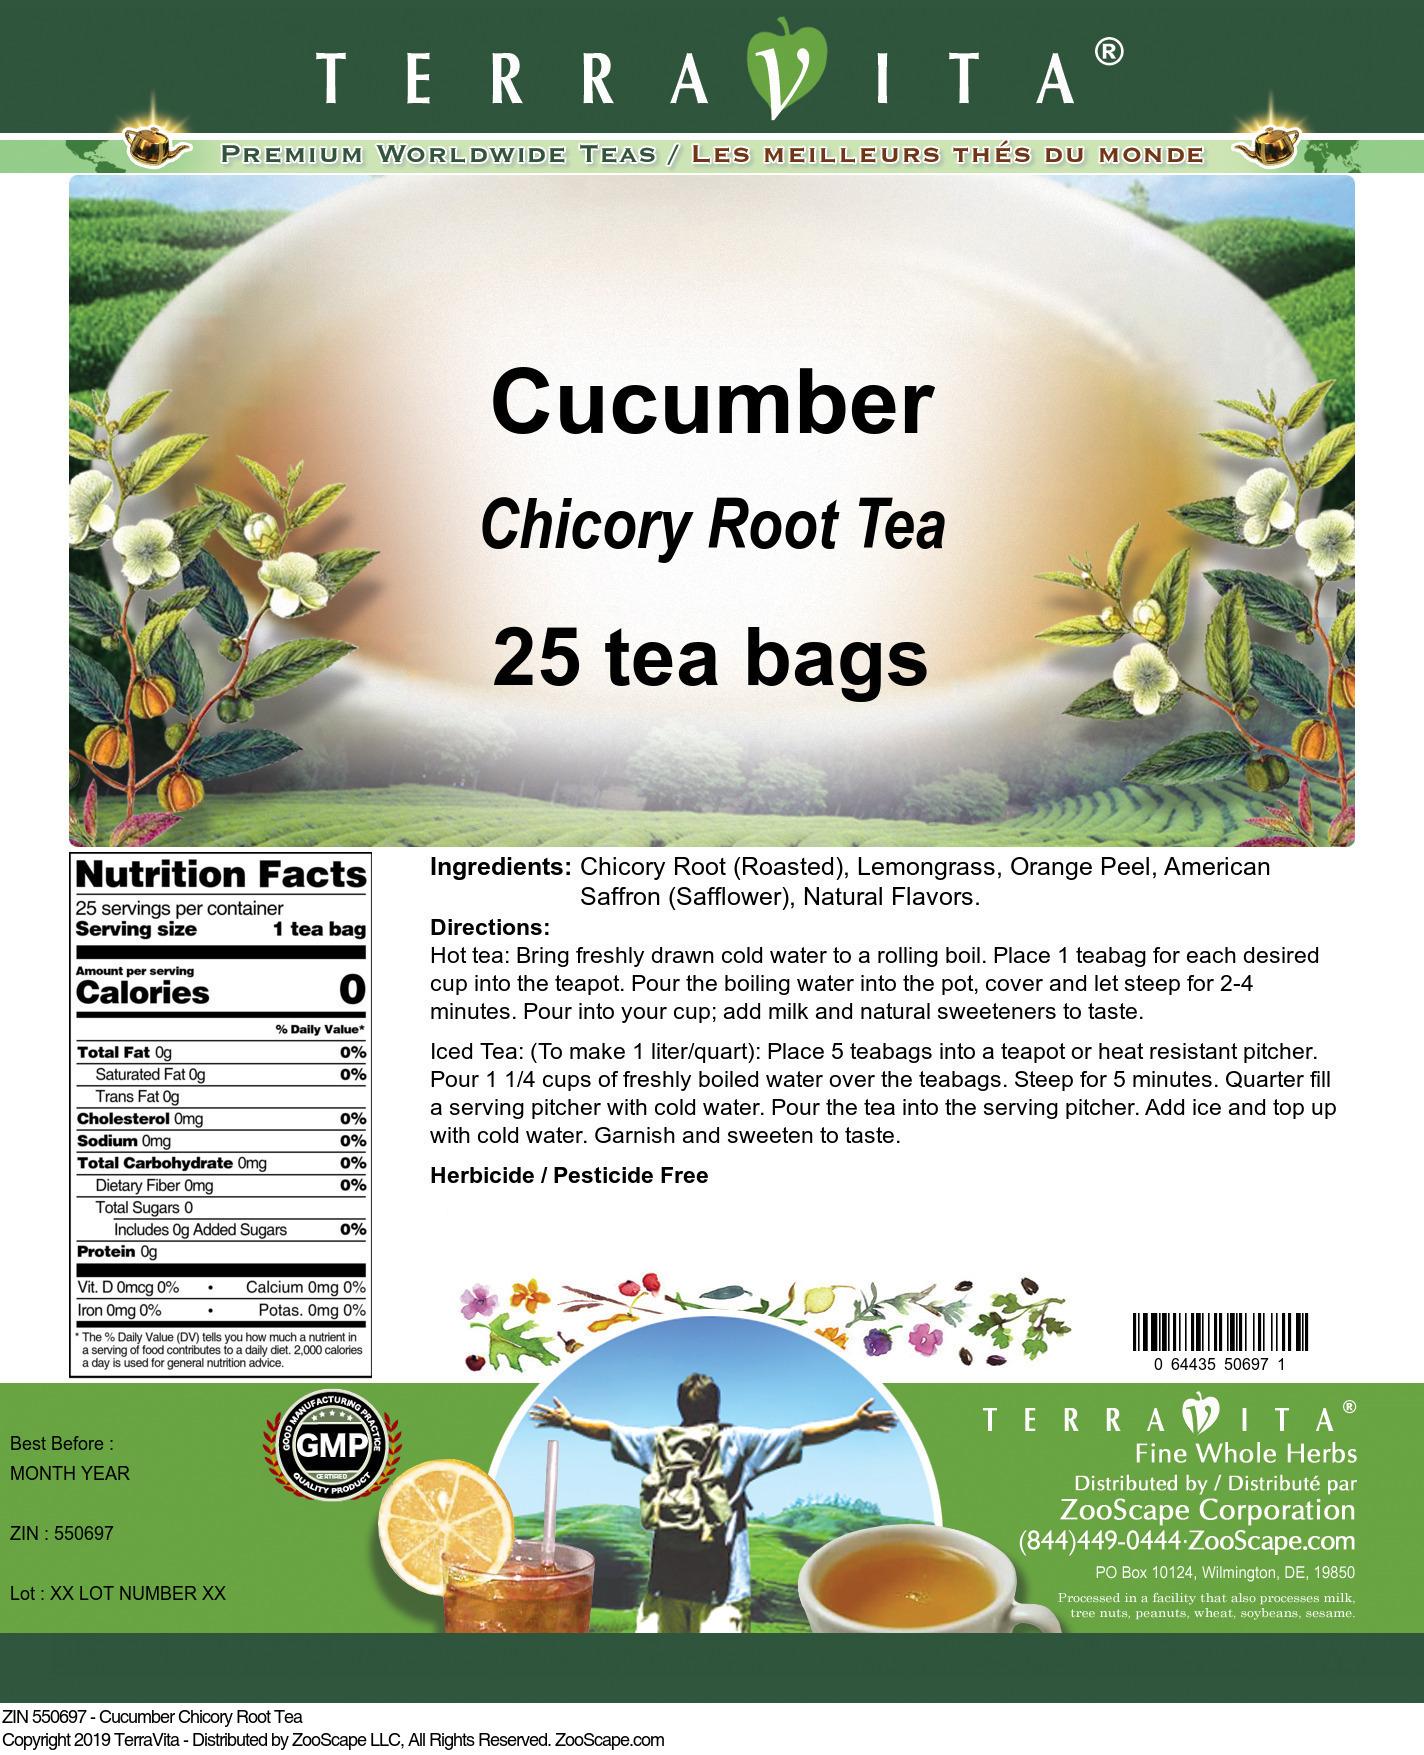 Cucumber Chicory Root Tea